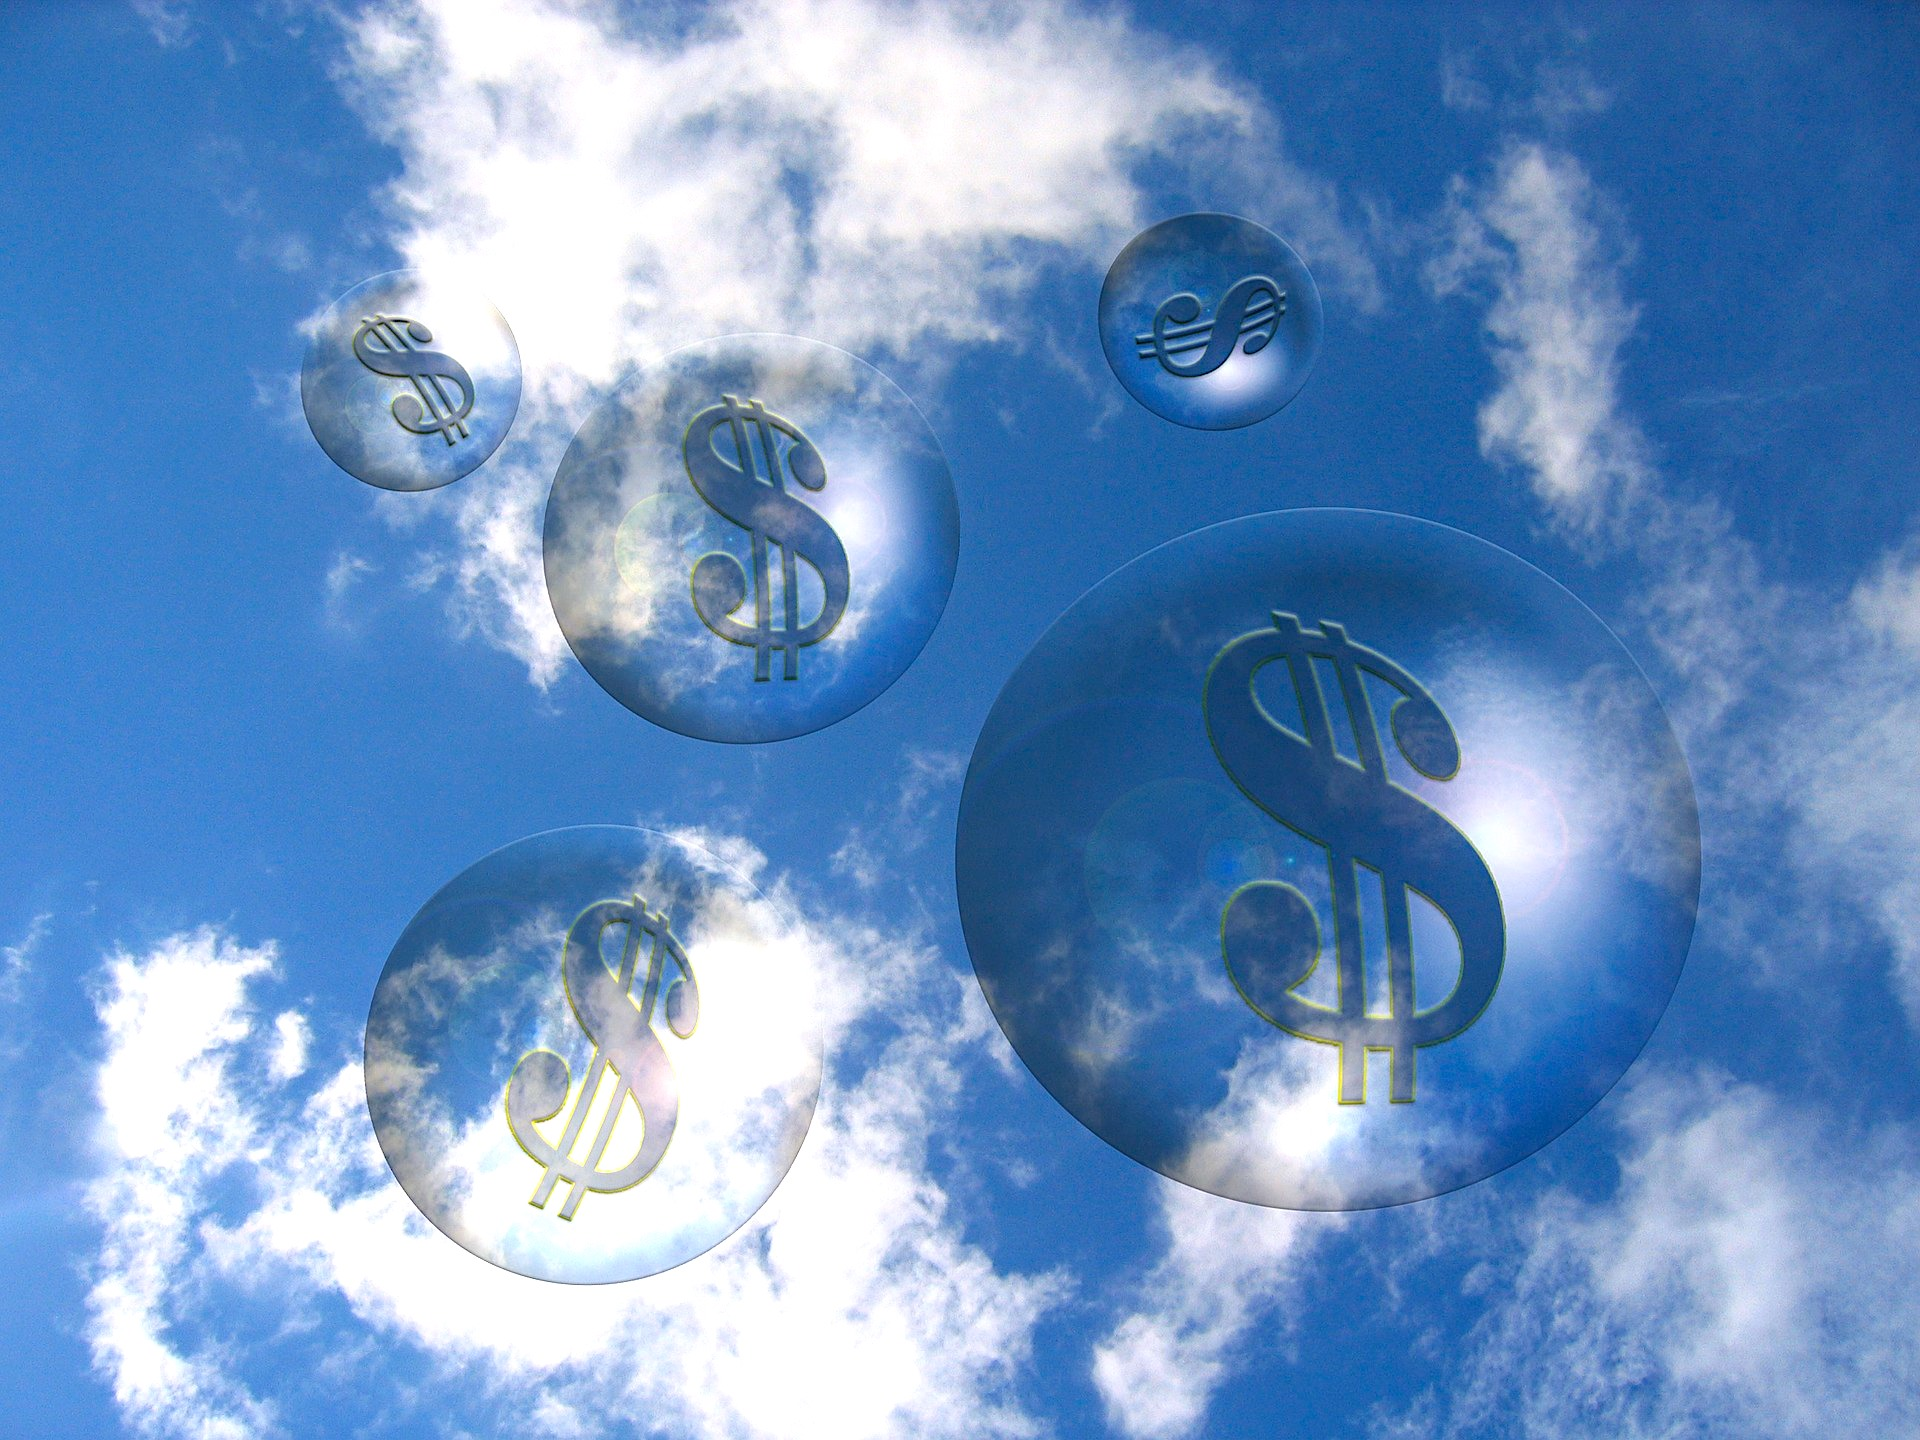 Cloud costs ignite fresh debate in tech community over where to run the enterprise - SiliconANGLE